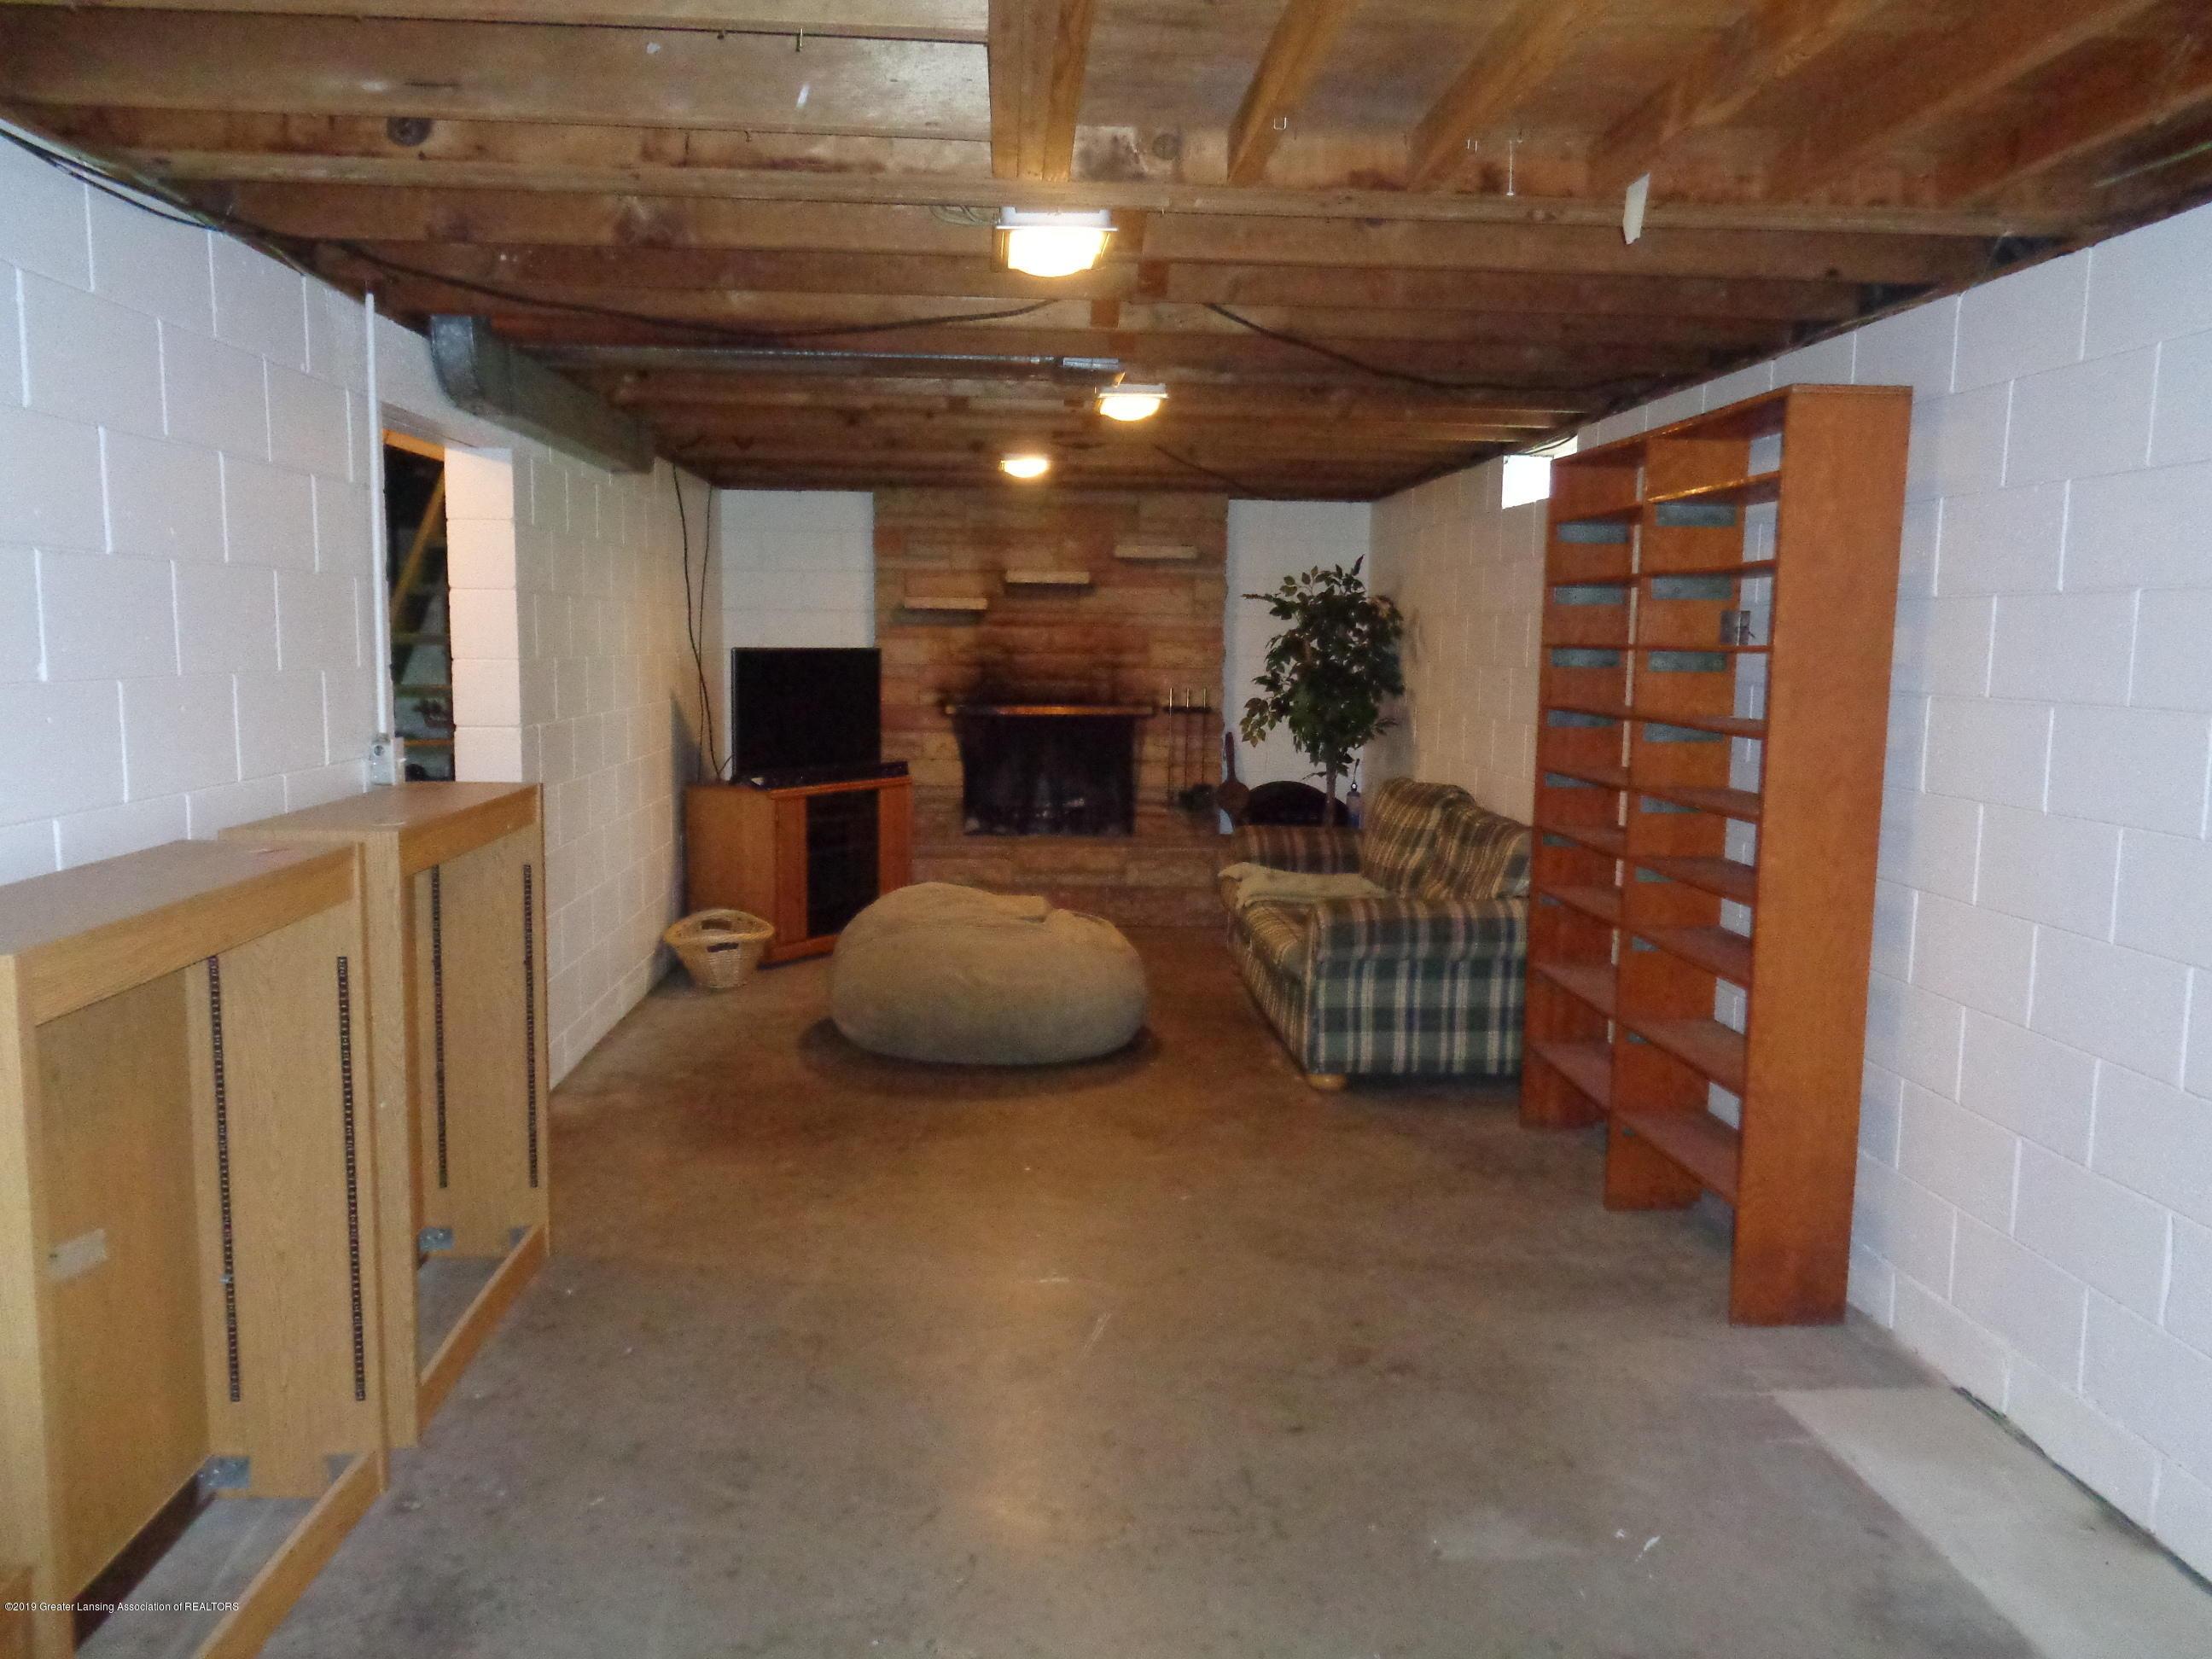 3525 W Kalamazoo St - kalamazoo basement 2 - 16